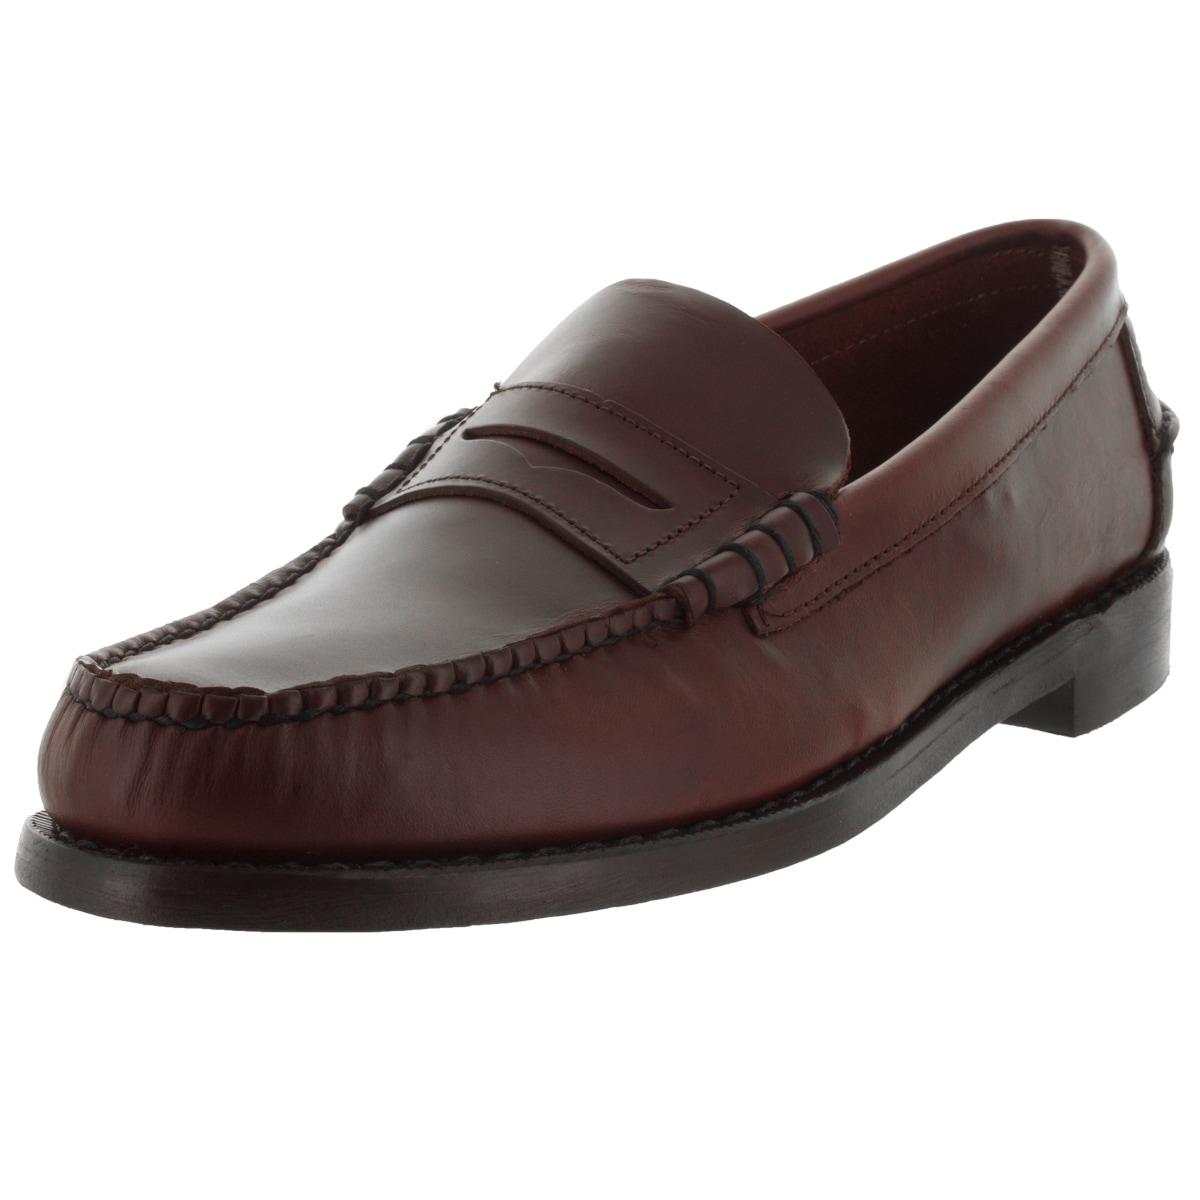 Sebago Men's Classic E Brown Oiled Waxy Loafers & Slip-On...